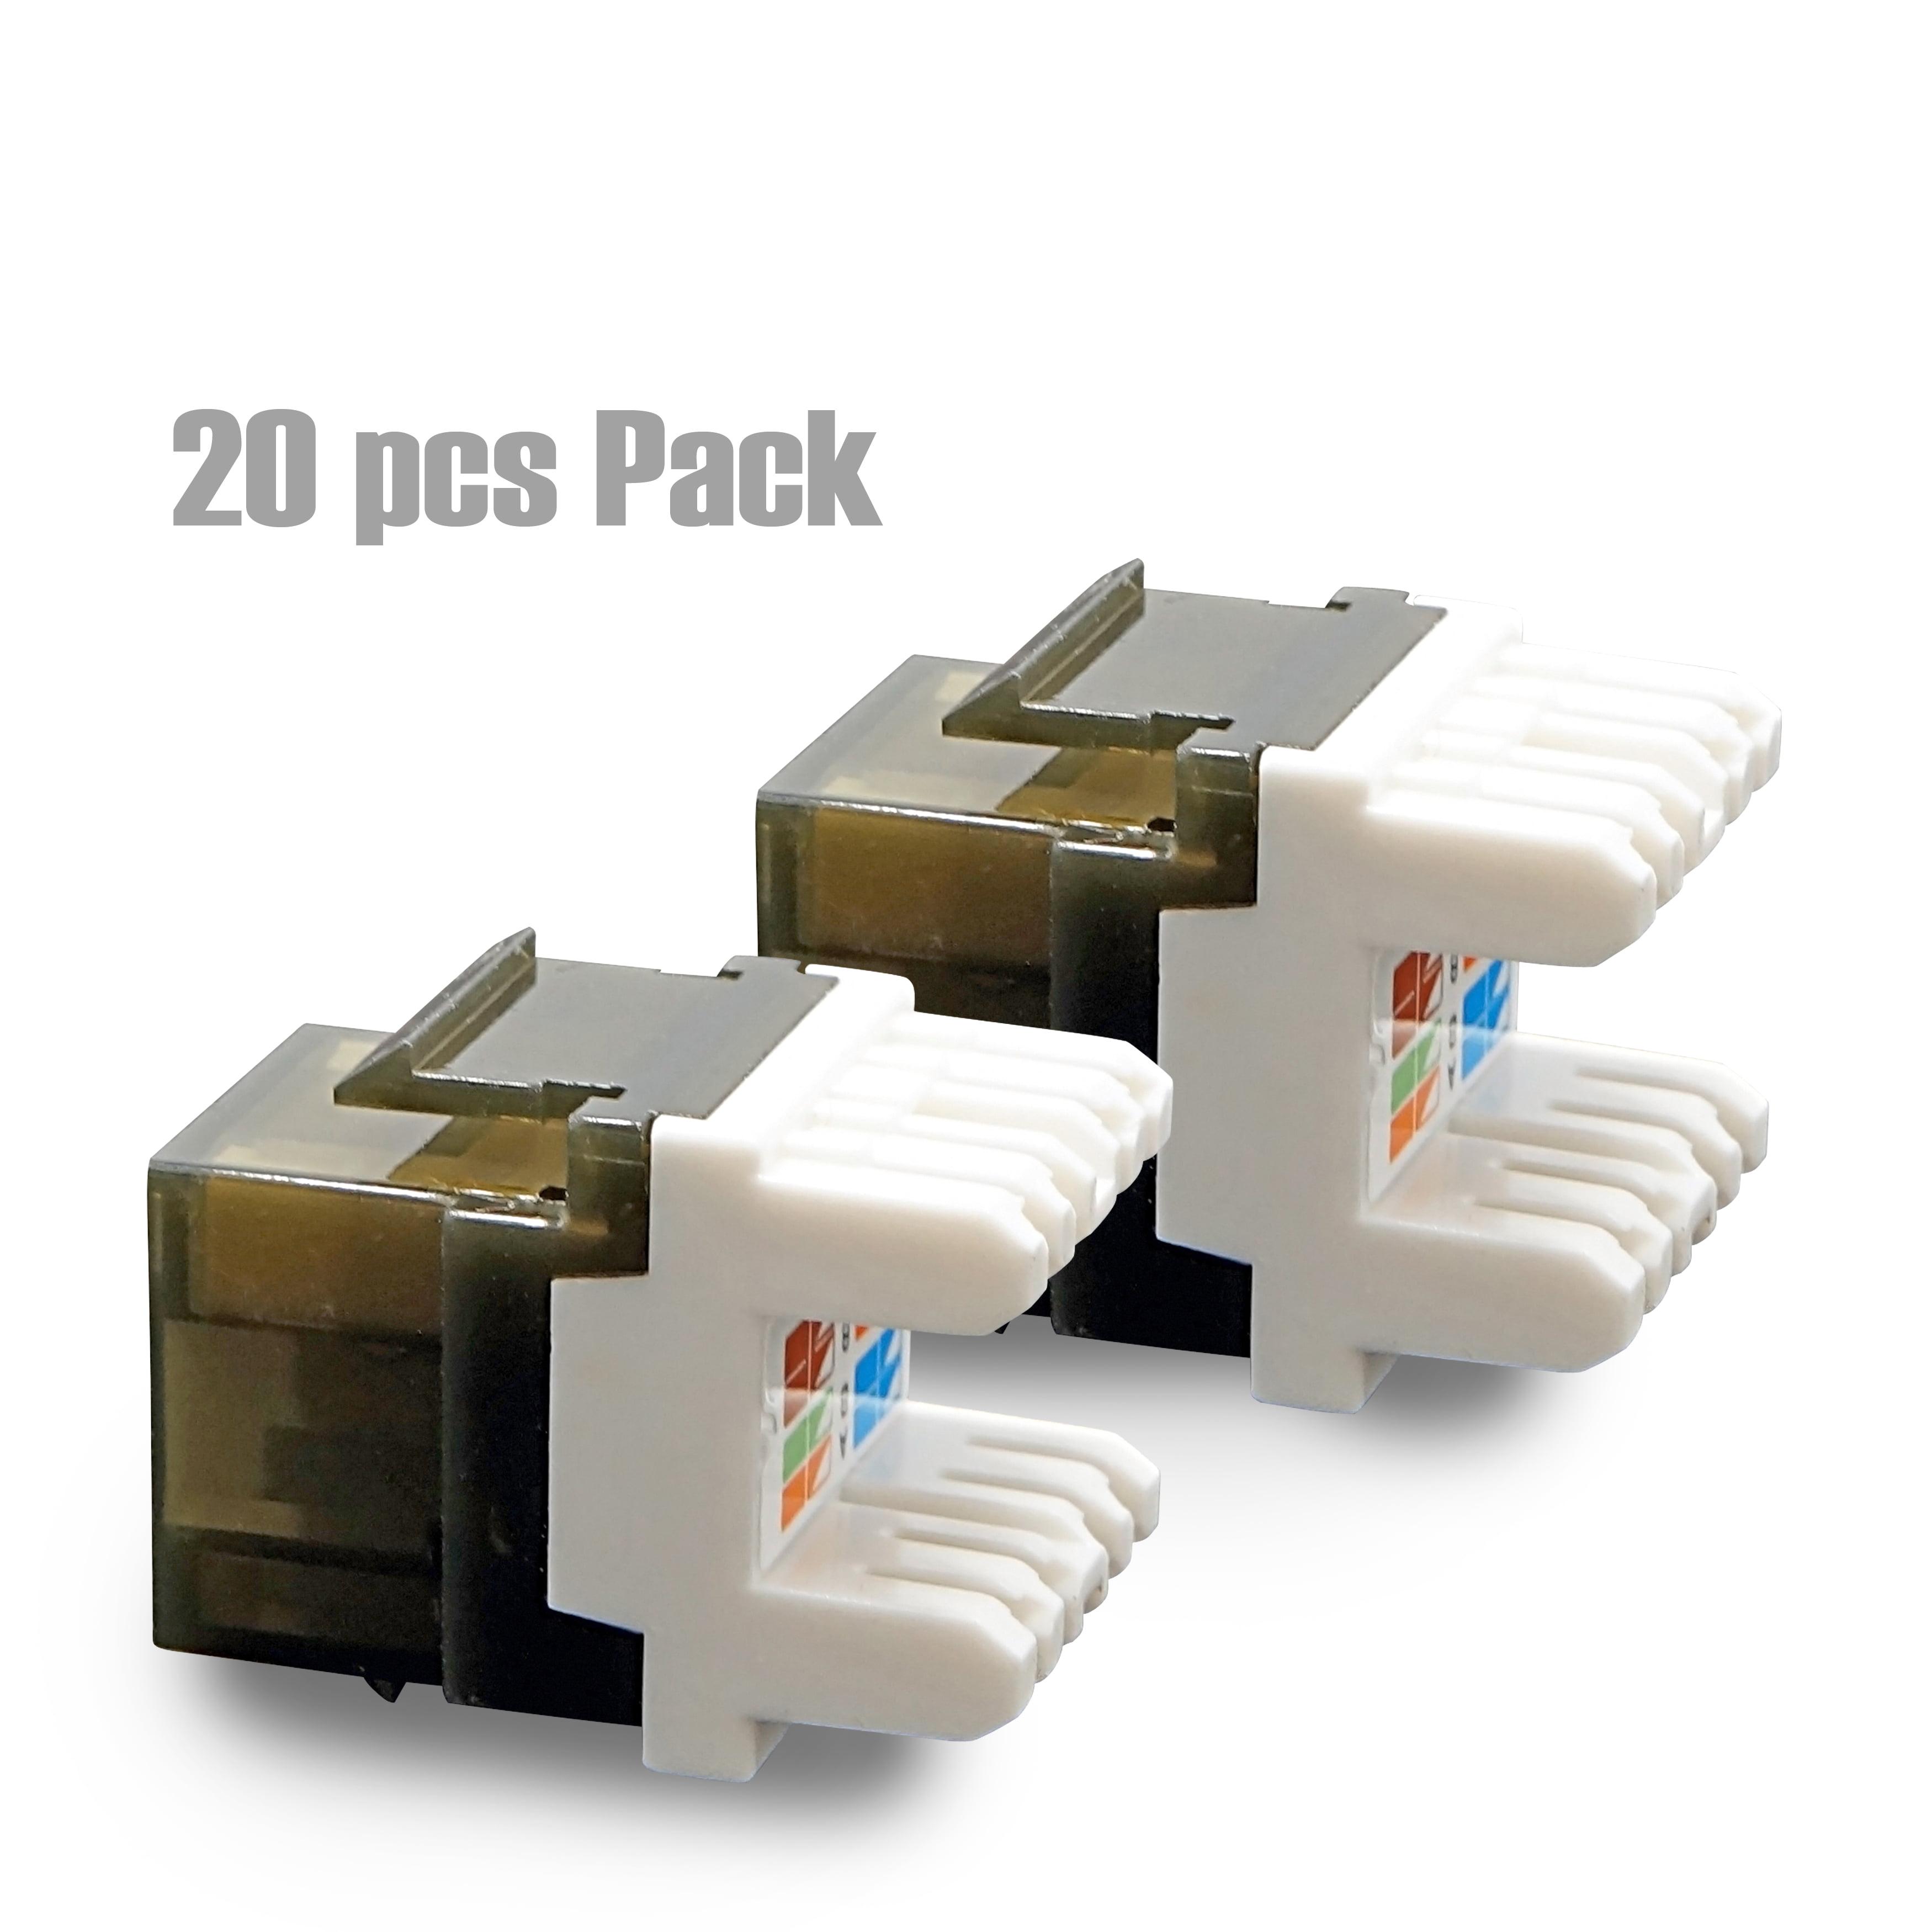 Cybertech Utp Cat 6a Cat 6 Cat 5e Keystone Jack With Led 20 Pack Walmart Com Walmart Com